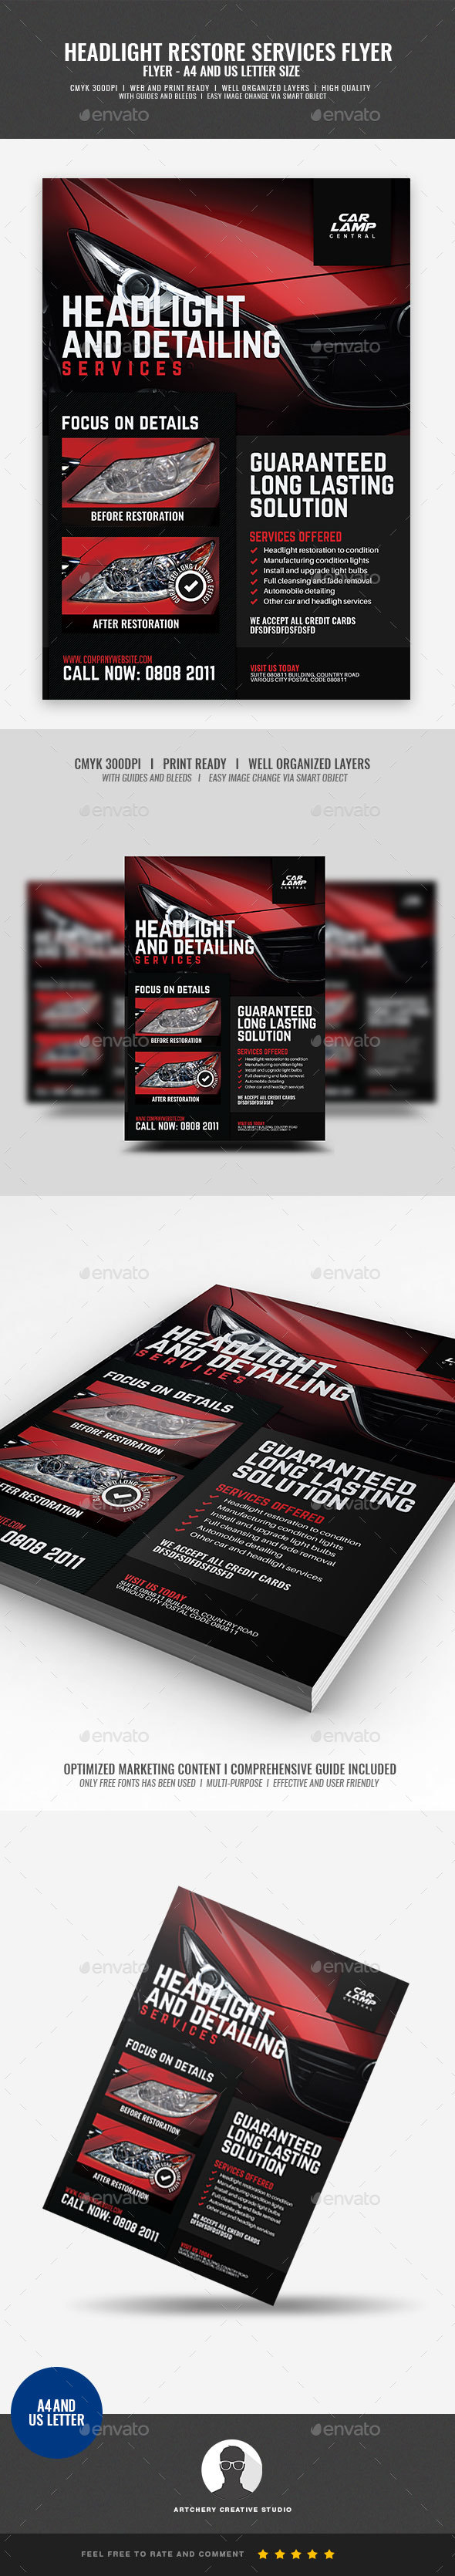 Headlight Restoration Promotional Flyer - Corporate Flyers